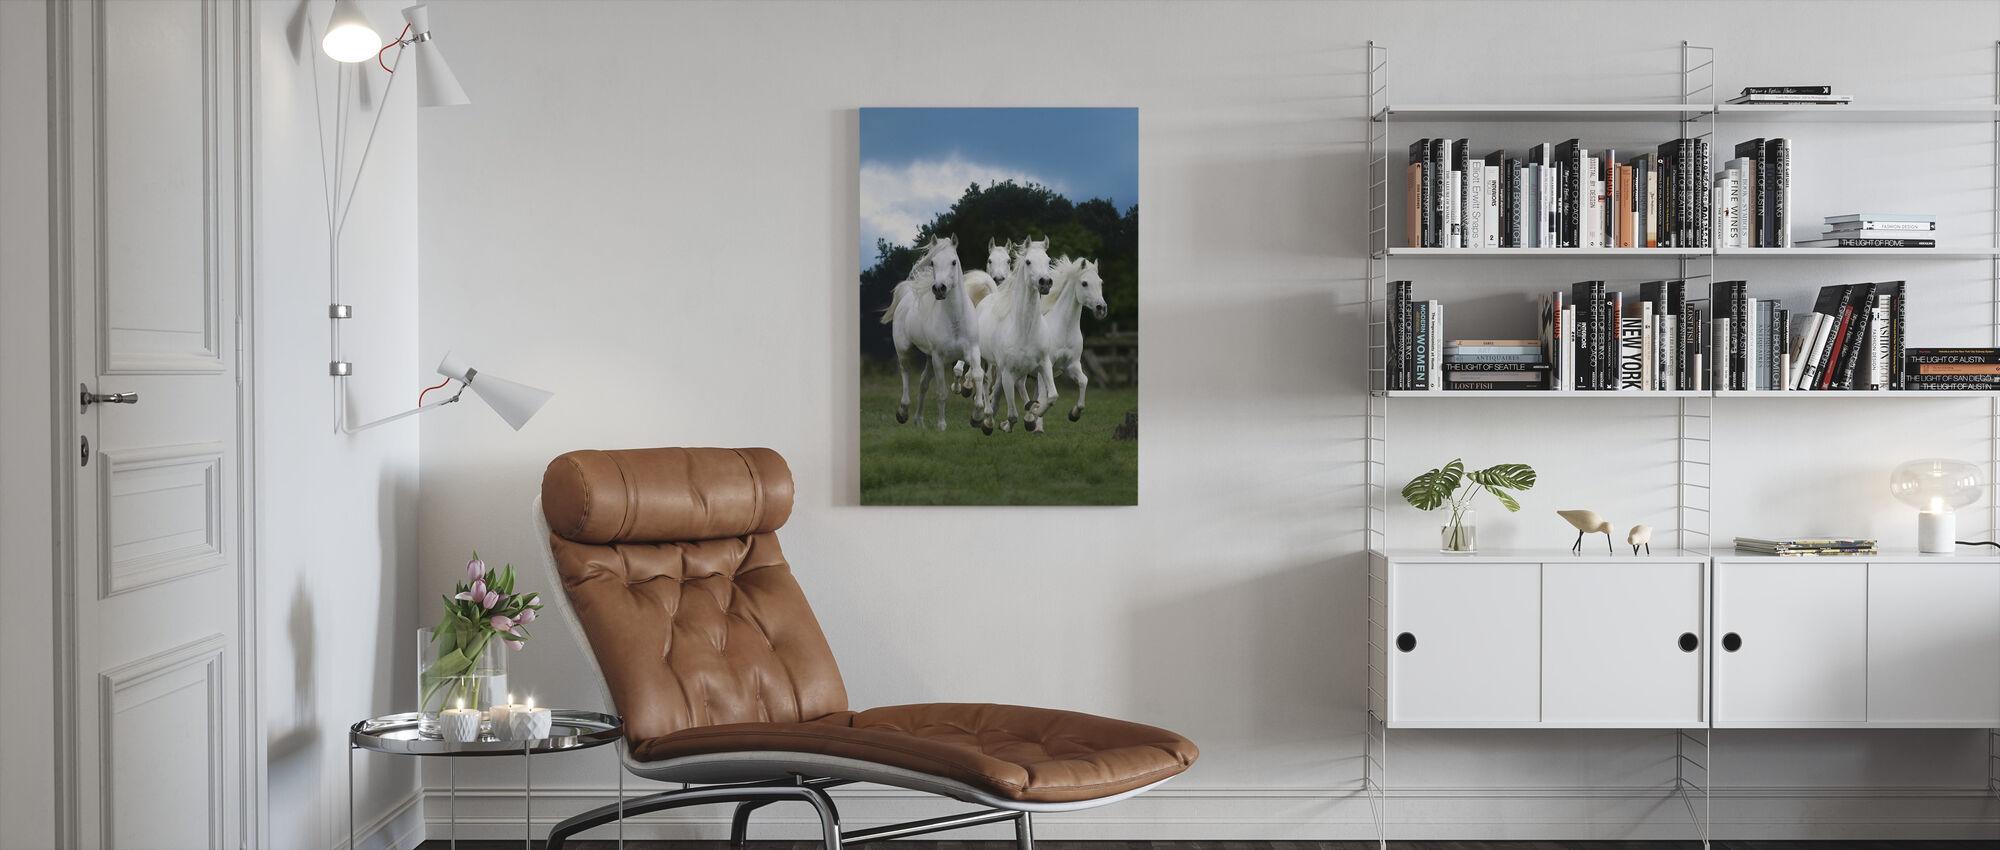 Shining White Horses - Canvas print - Living Room